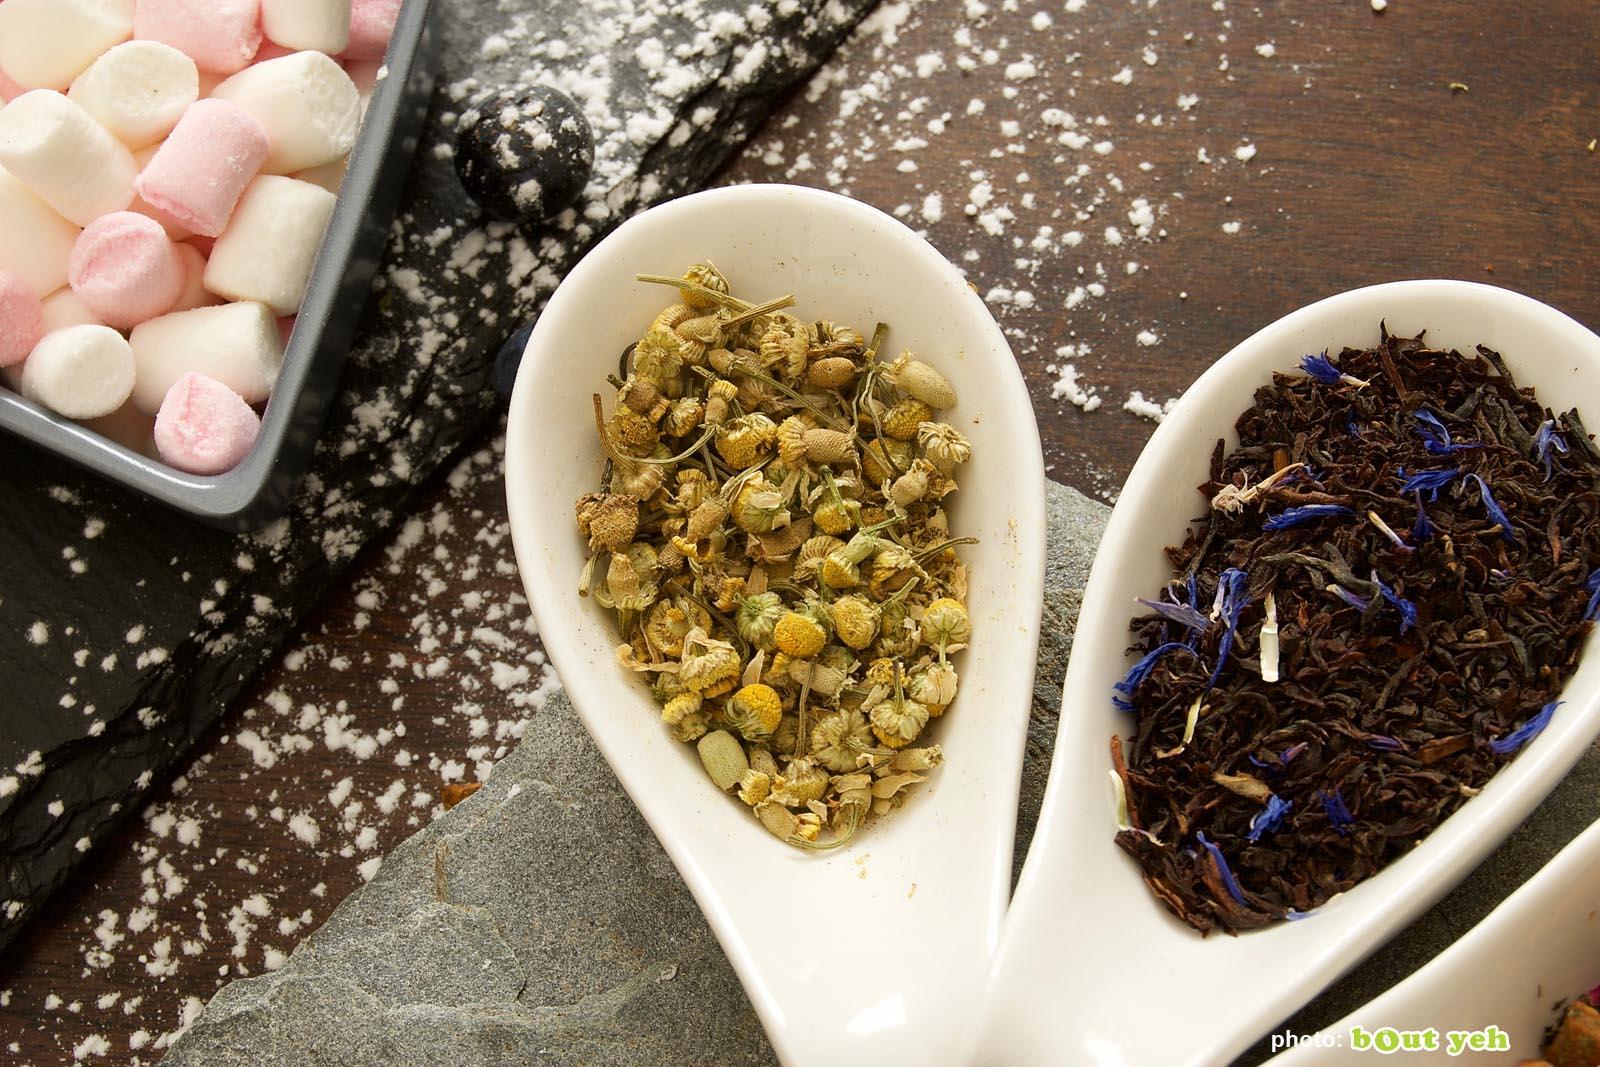 Food photographers Belfast portfolio photo 1384 - selection of herbal tea ingredients in measuring bowls